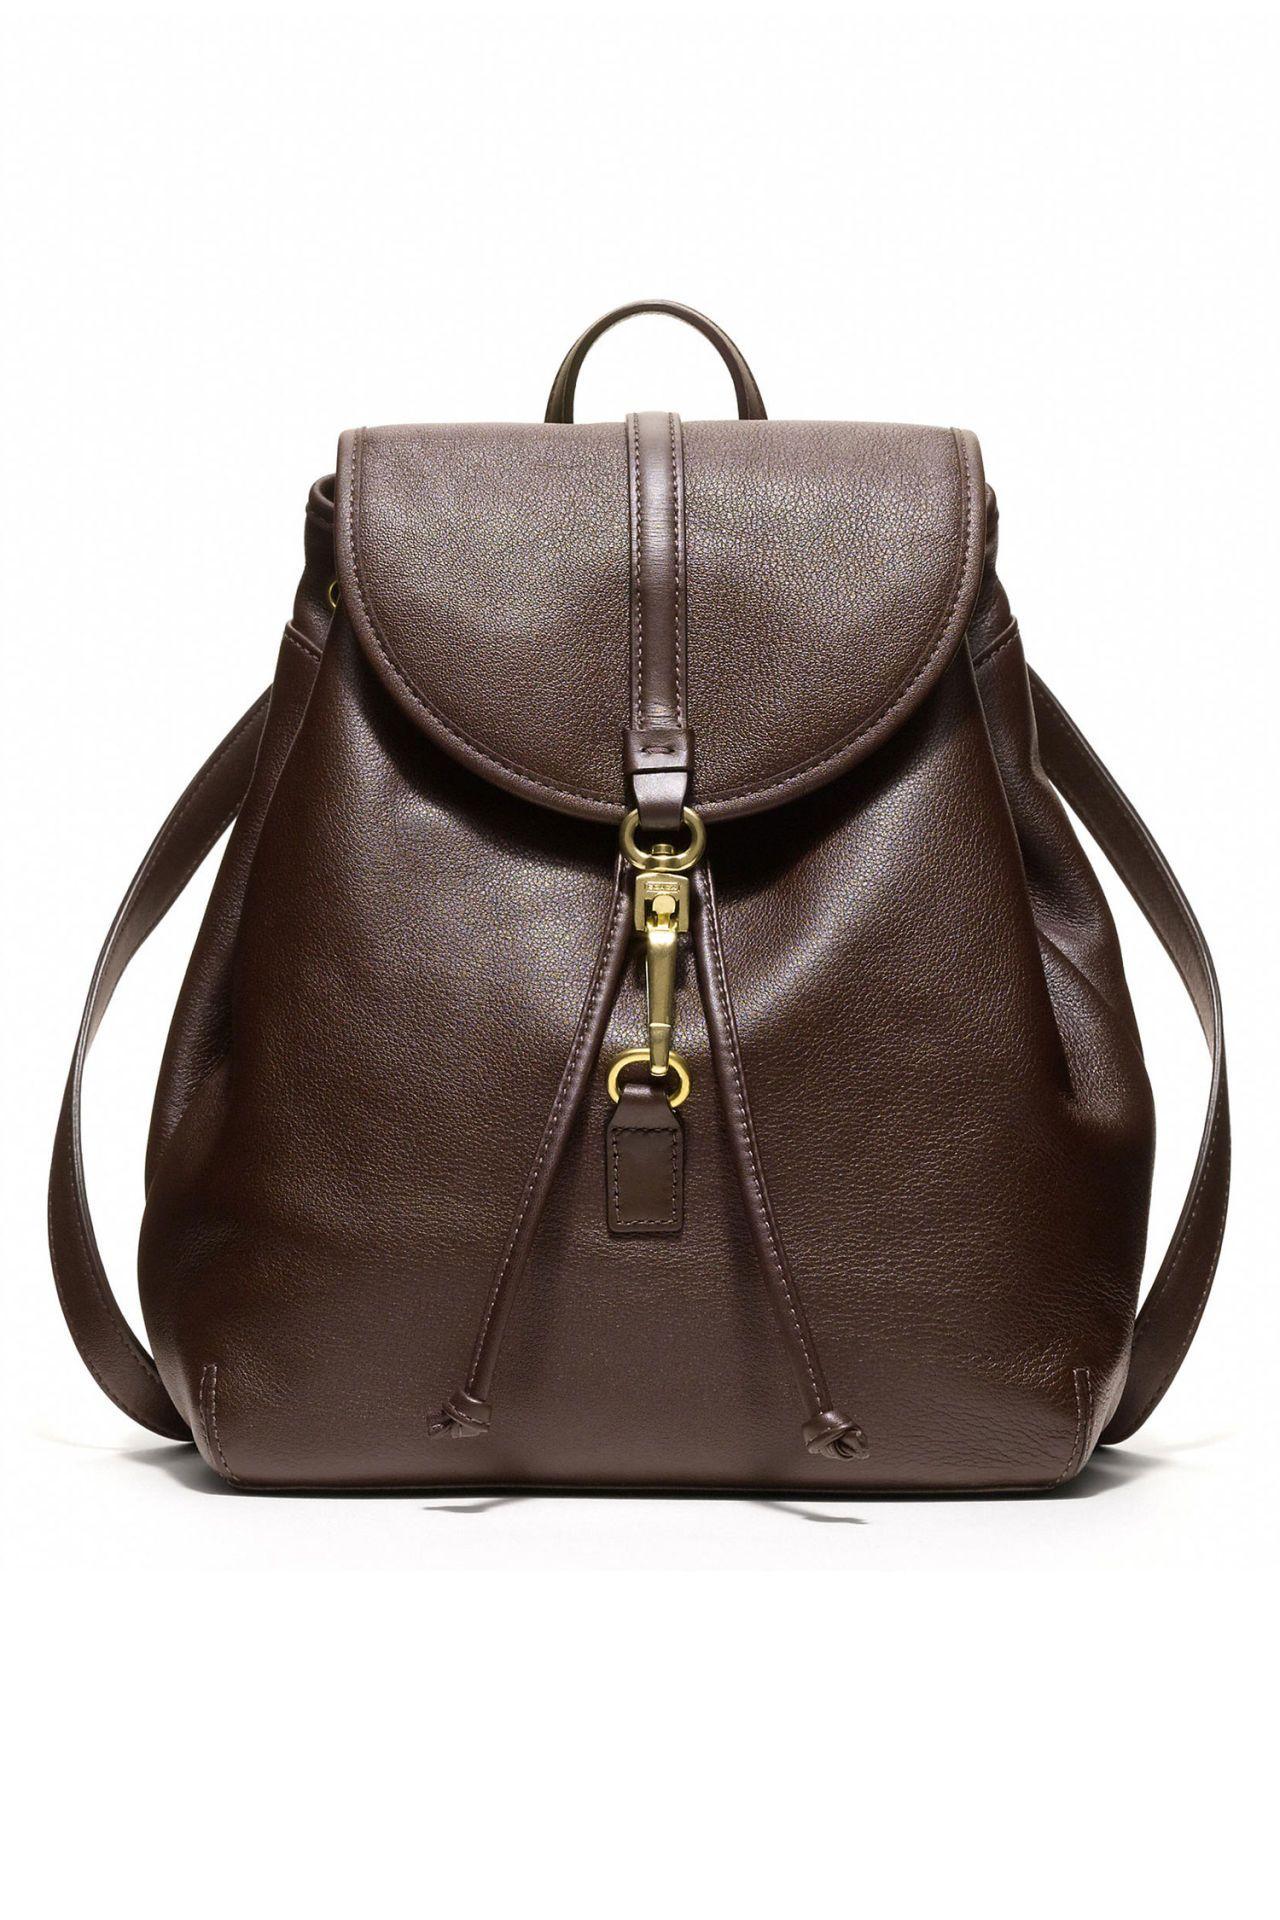 Designer Backpack Women - Top Reviewed Backpacks